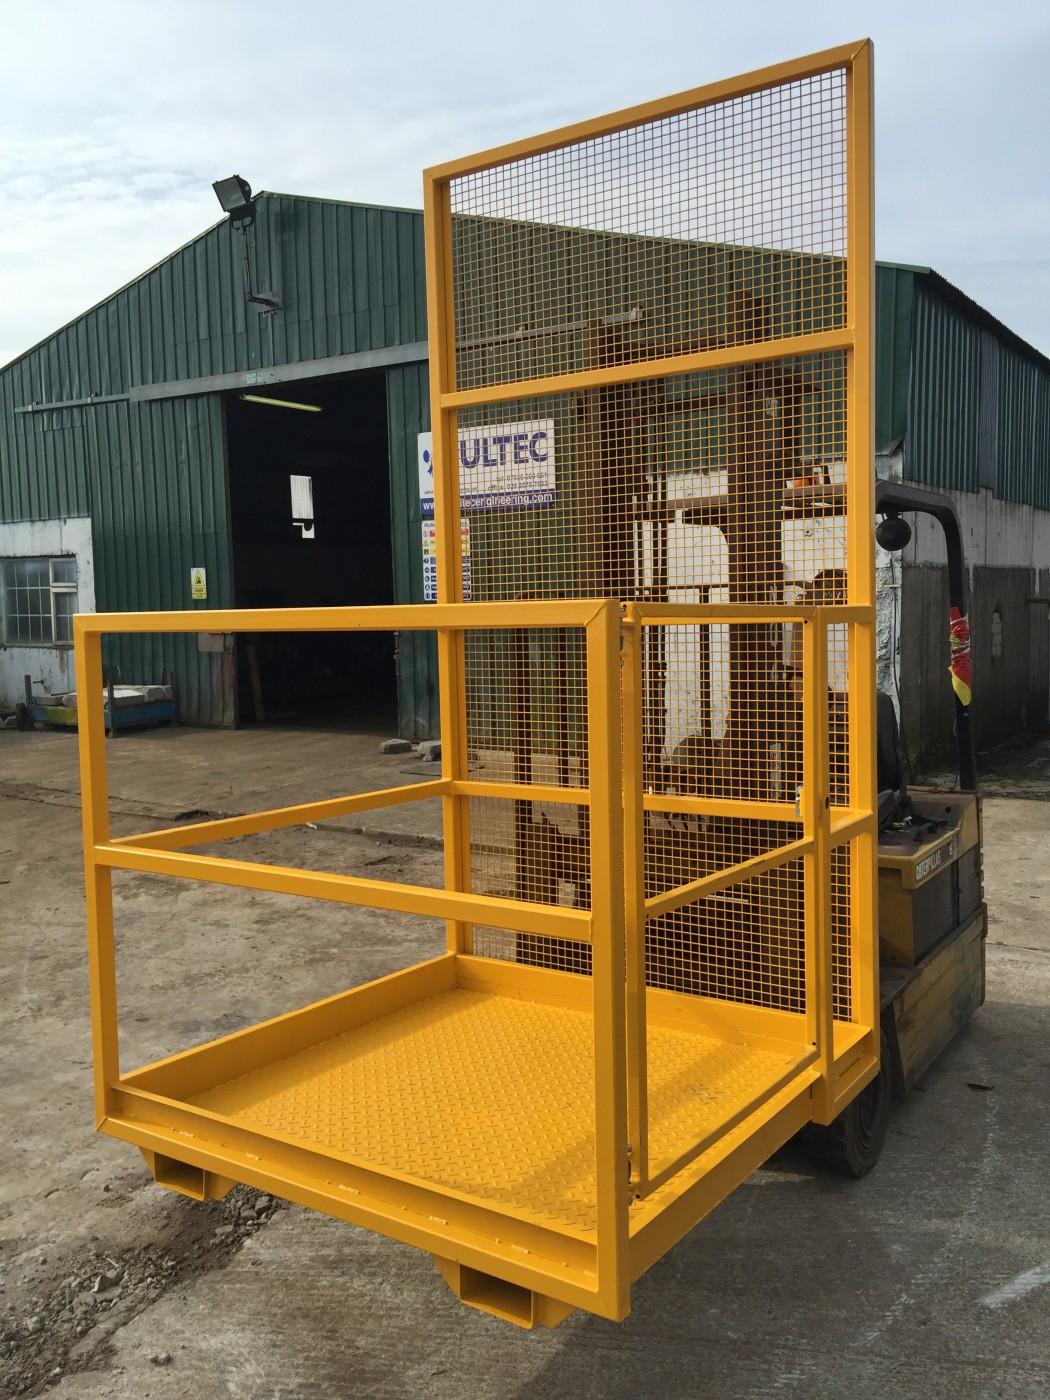 4ft Manlift Amp Agri Basket Mesh Guard Model Multec